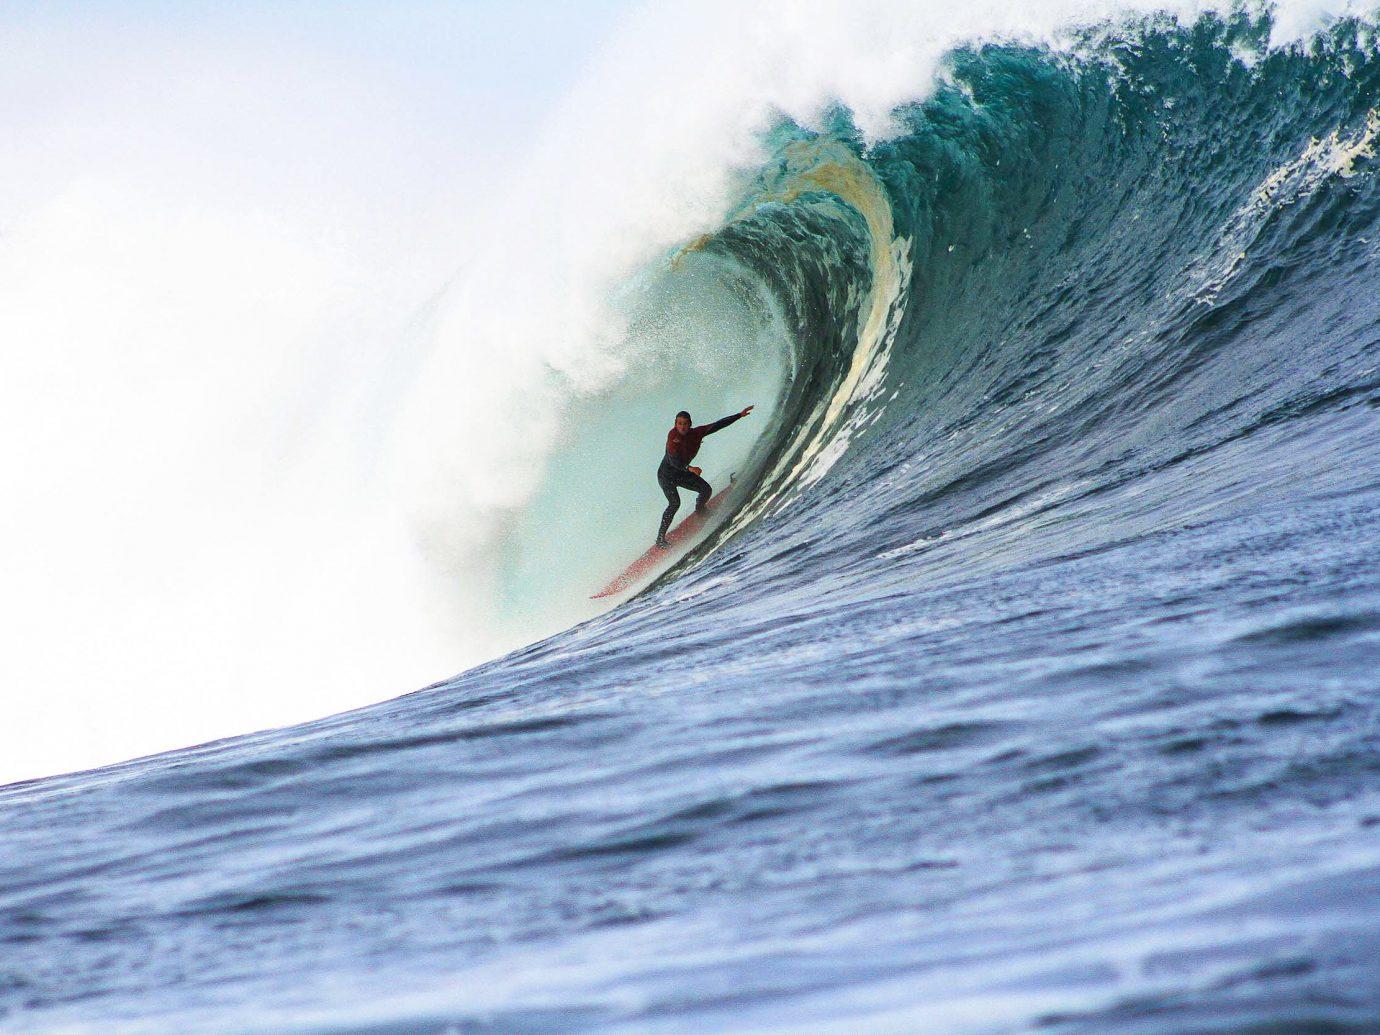 wave surfing wind wave surfing equipment and supplies water boardsport surfboard Ocean water sport surface water sports extreme sport Sea sky